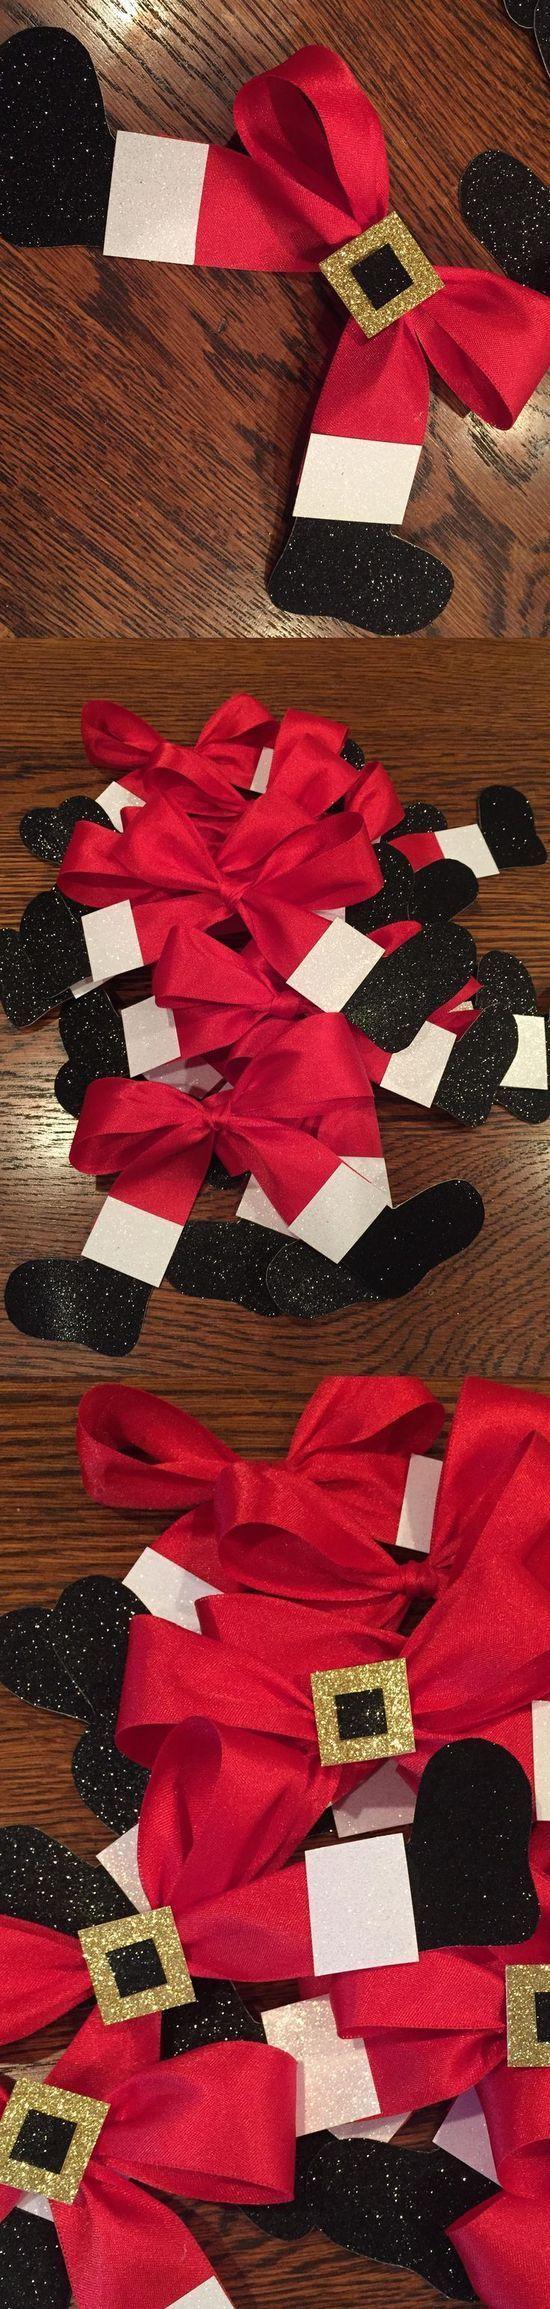 CHRISTMAS IDEAS EN STYLE FASHION BROWNIE COLESLAW